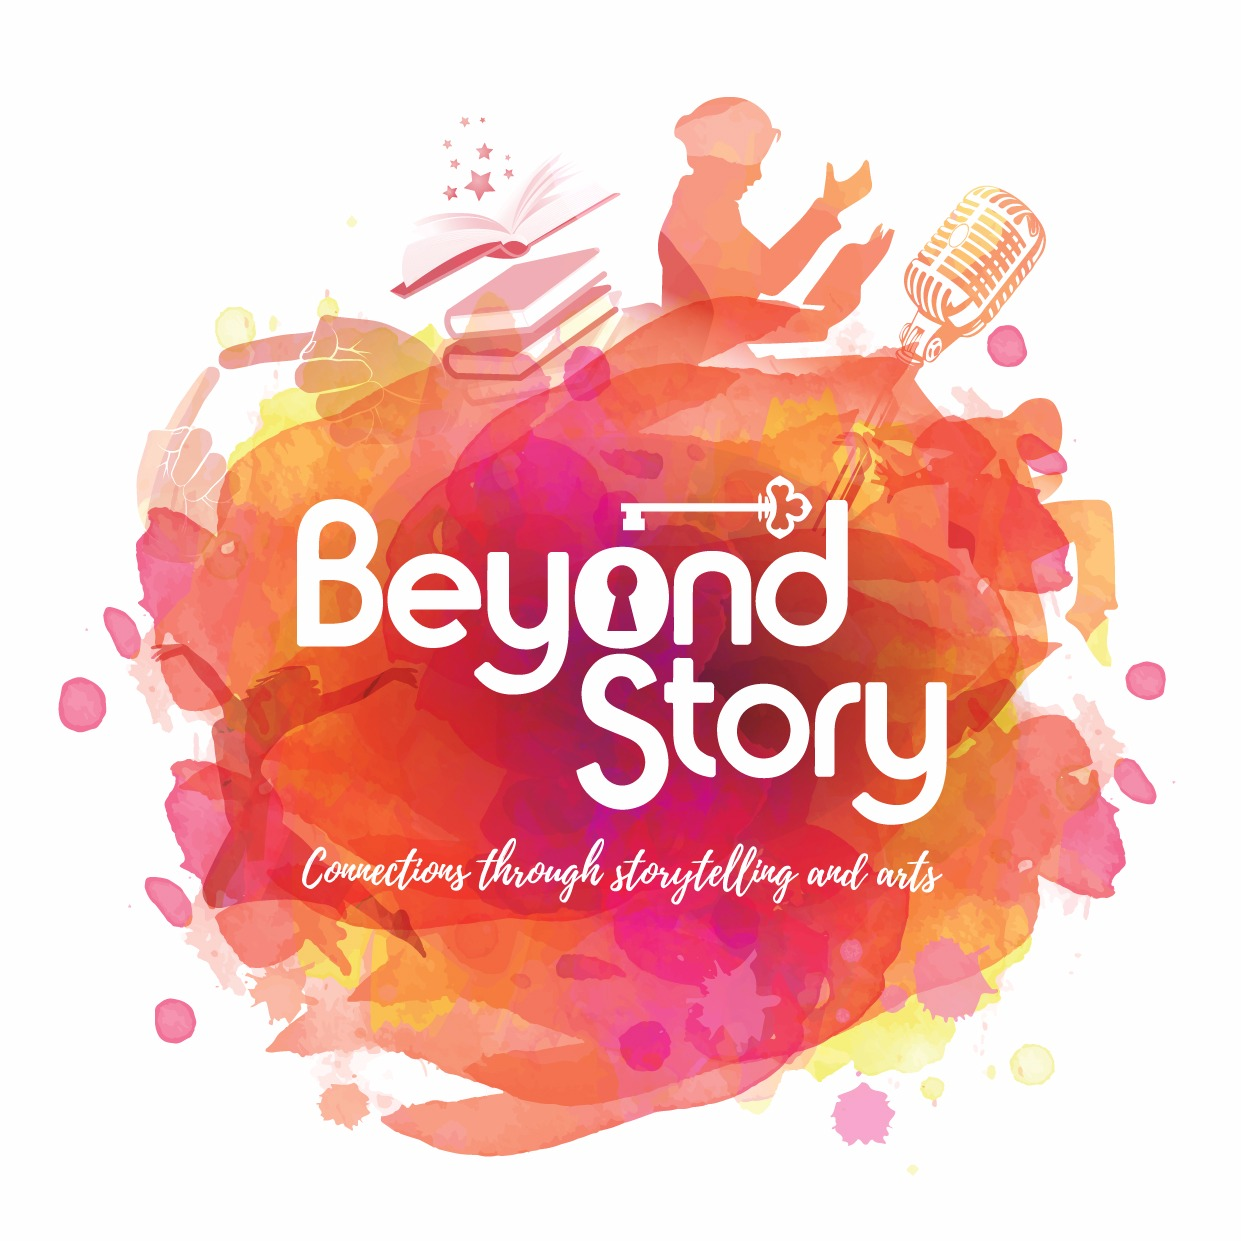 Beyond Story